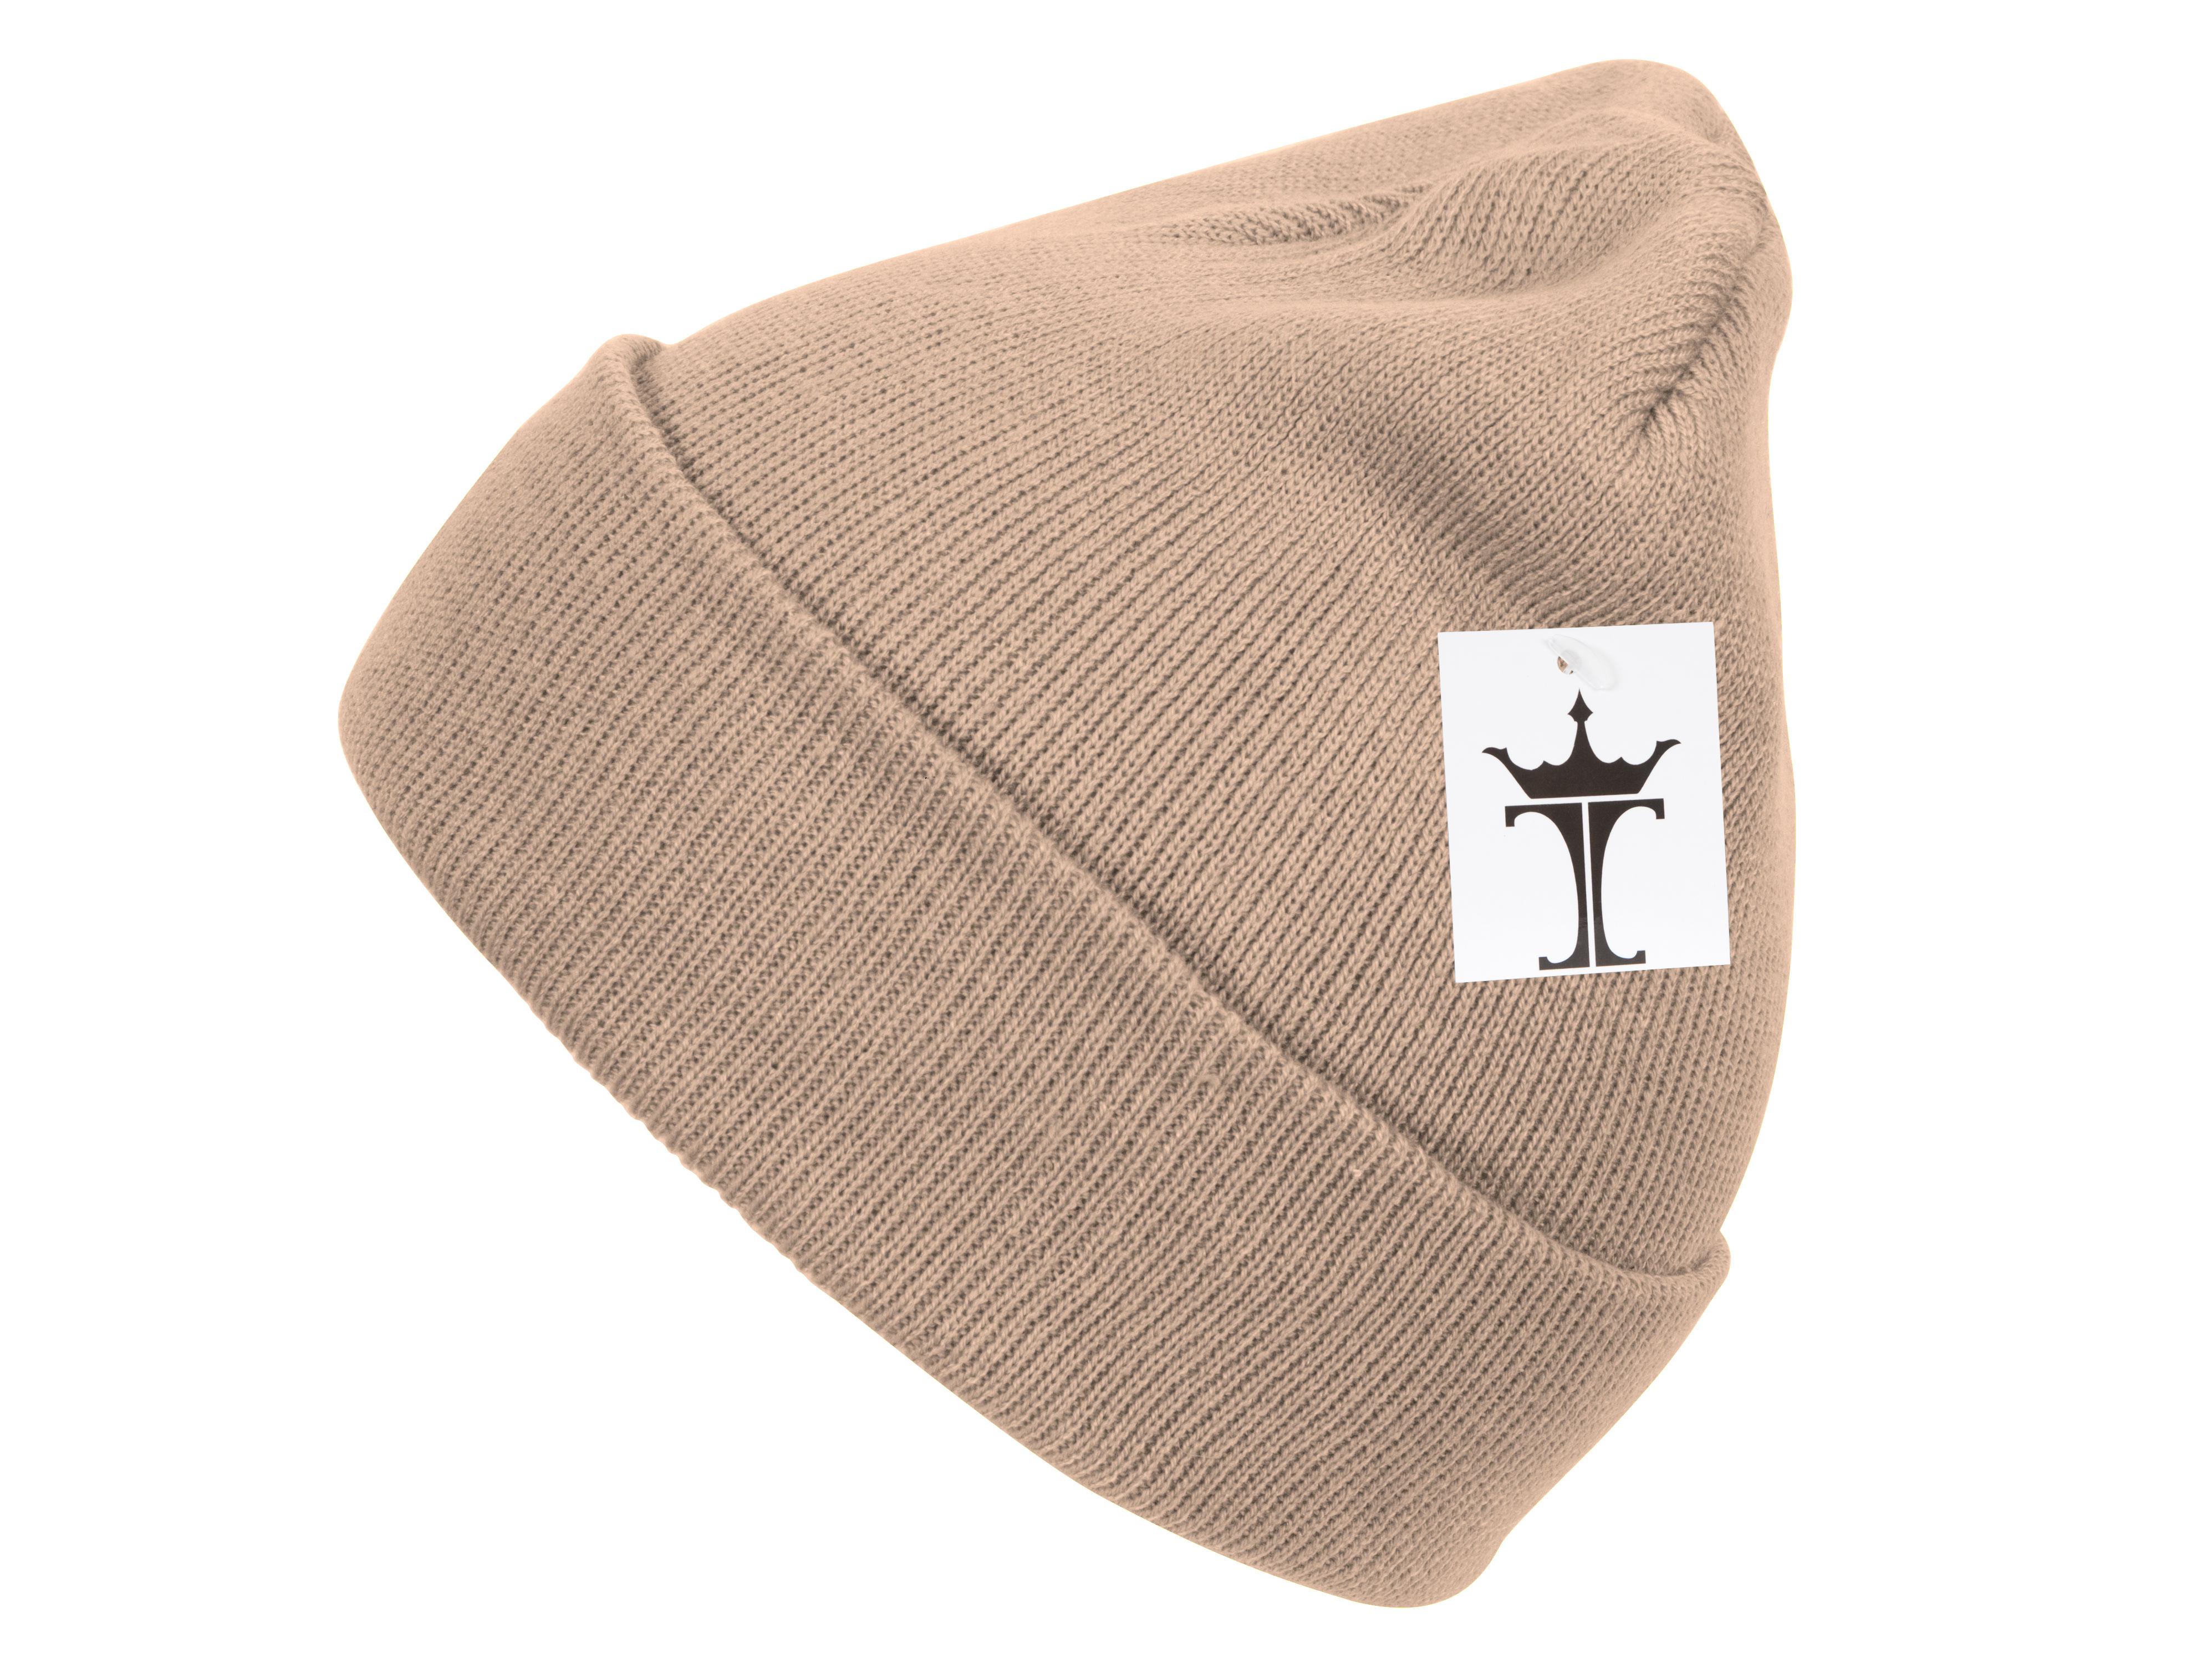 thumbnail 46 - Top Headwear Solid Winter Long Beanie - 12 Piece Wholesale